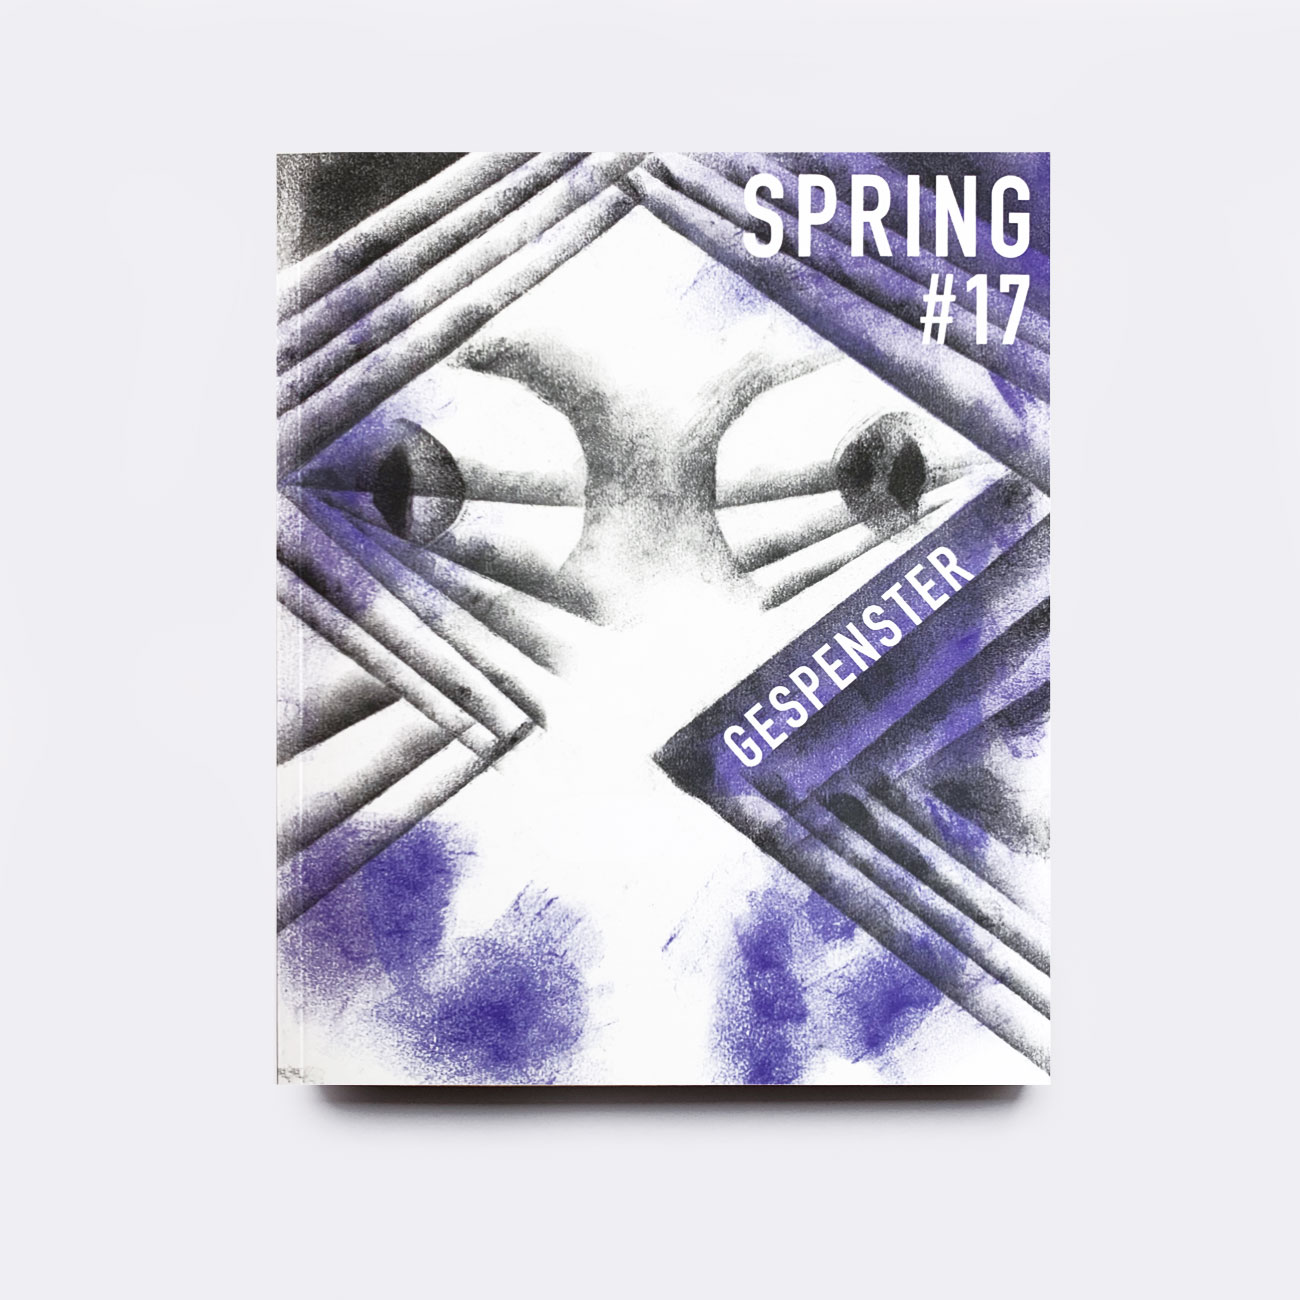 Spring-Magazin, illustriert, Thema Gespenster